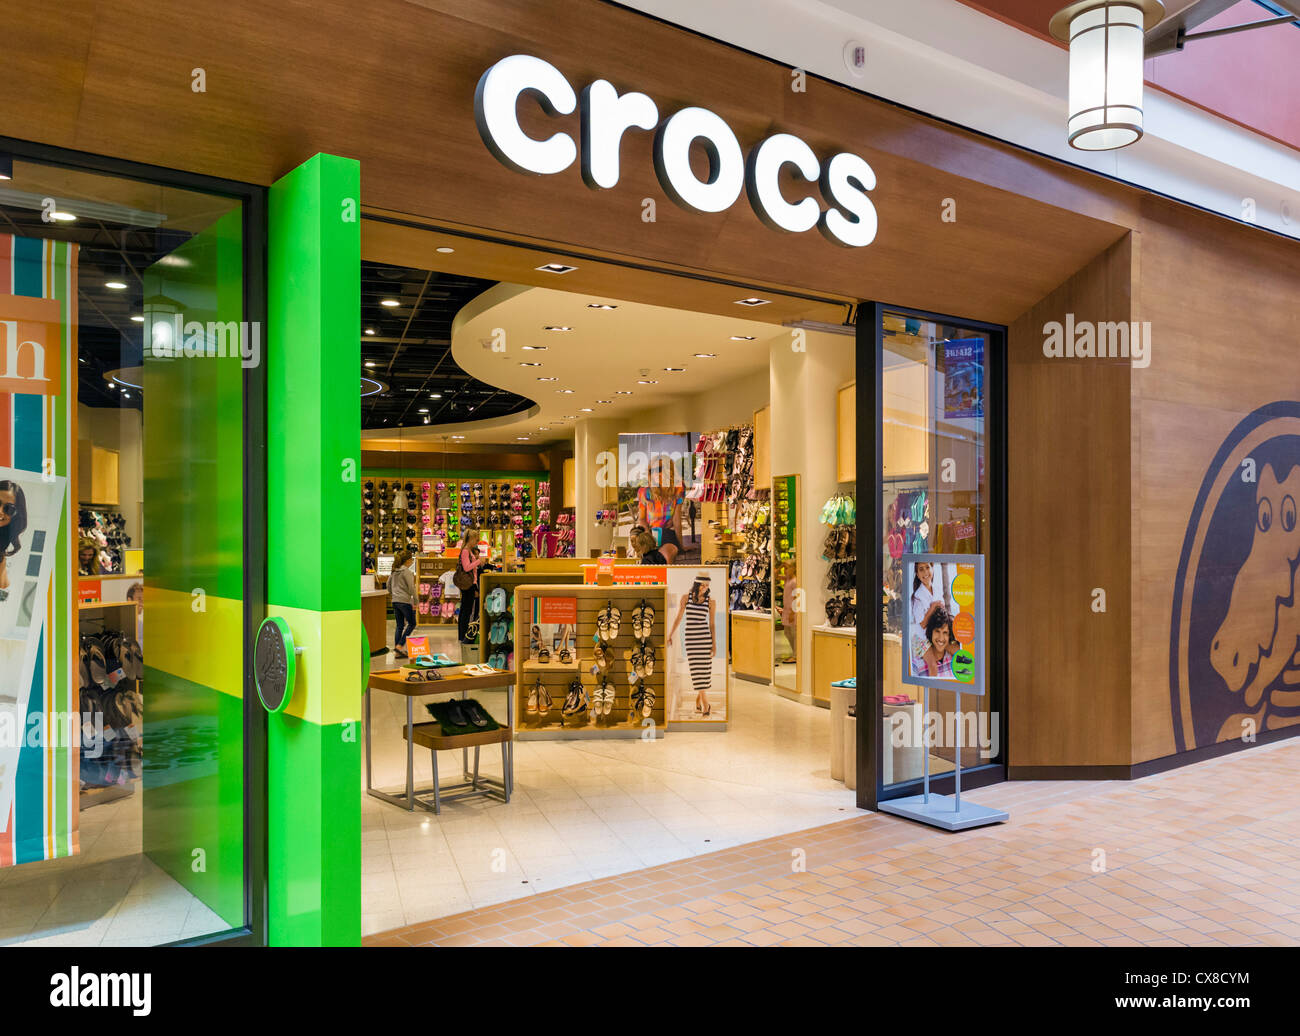 12acb92d3c4 Crocs magasin dans le centre commercial Mall of America